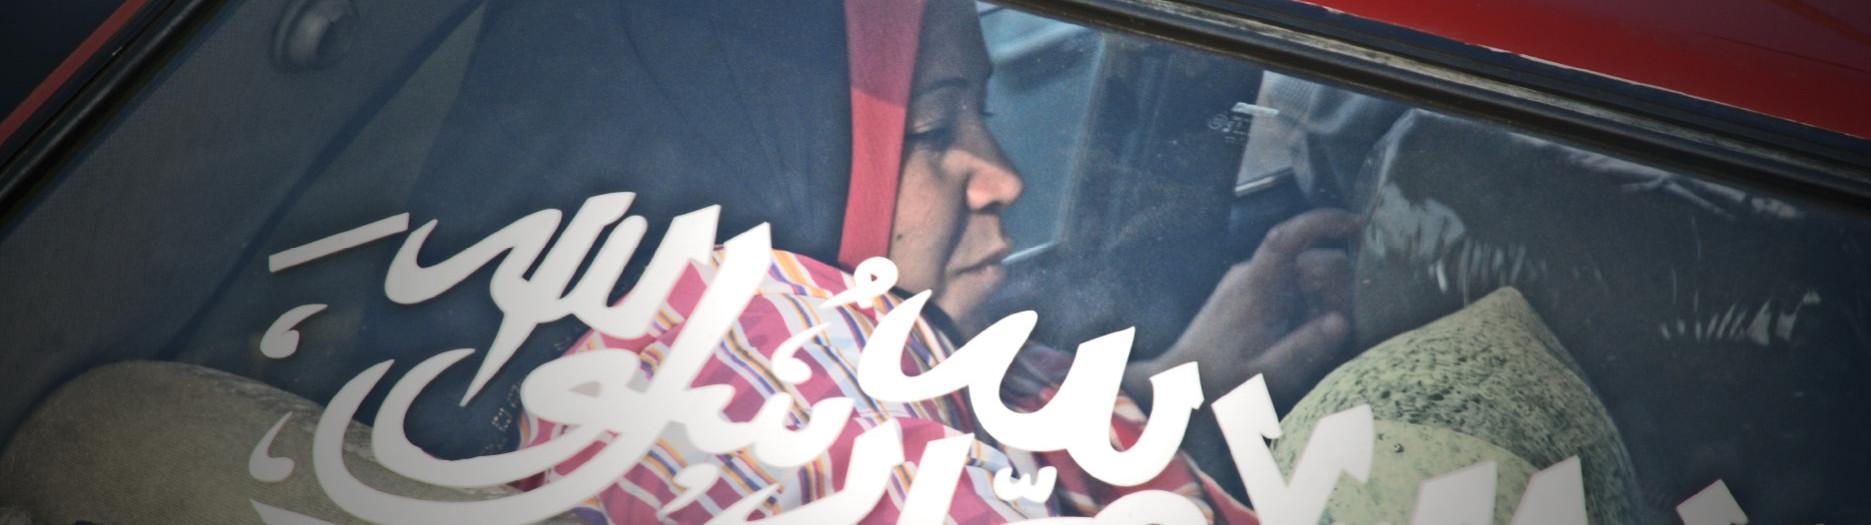 Reportage Cairo